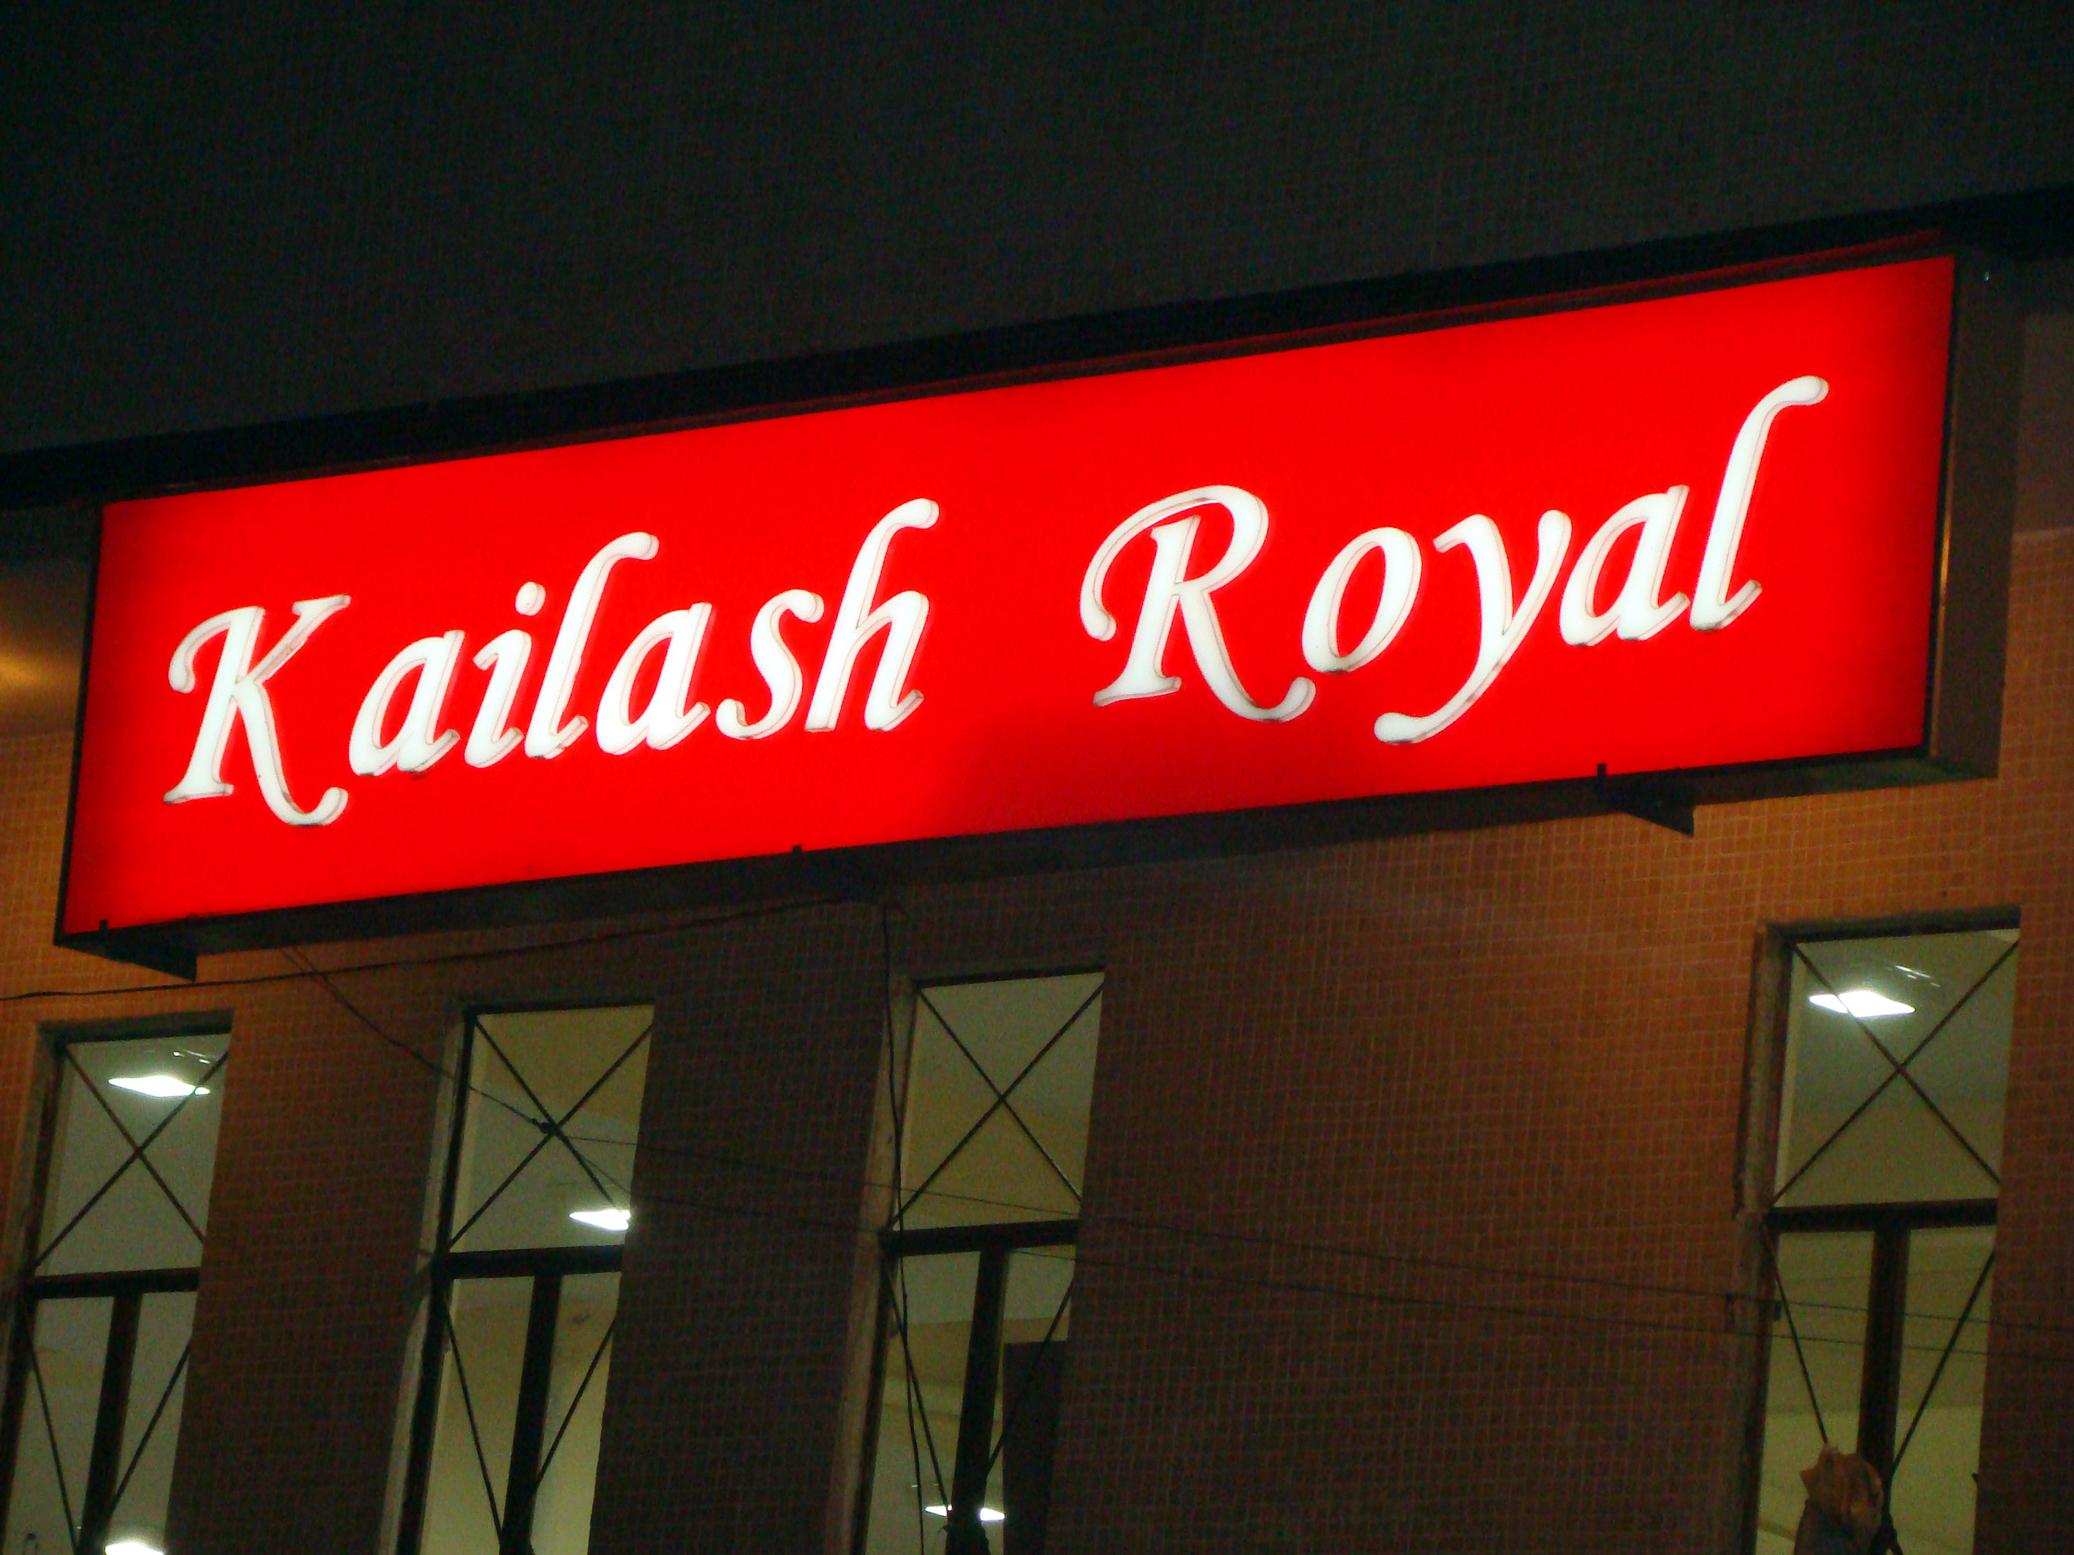 Kailash Royal